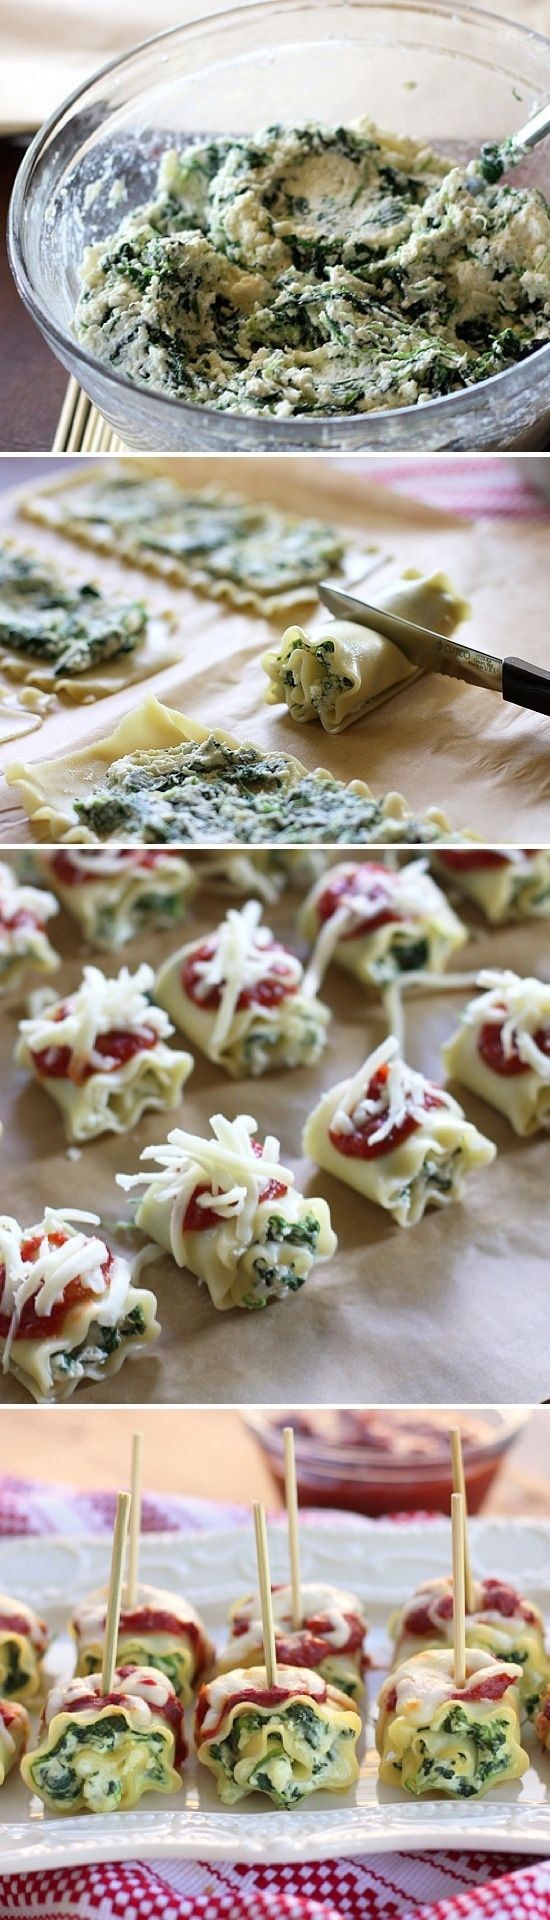 Mini Spinach Lasagna Rolls